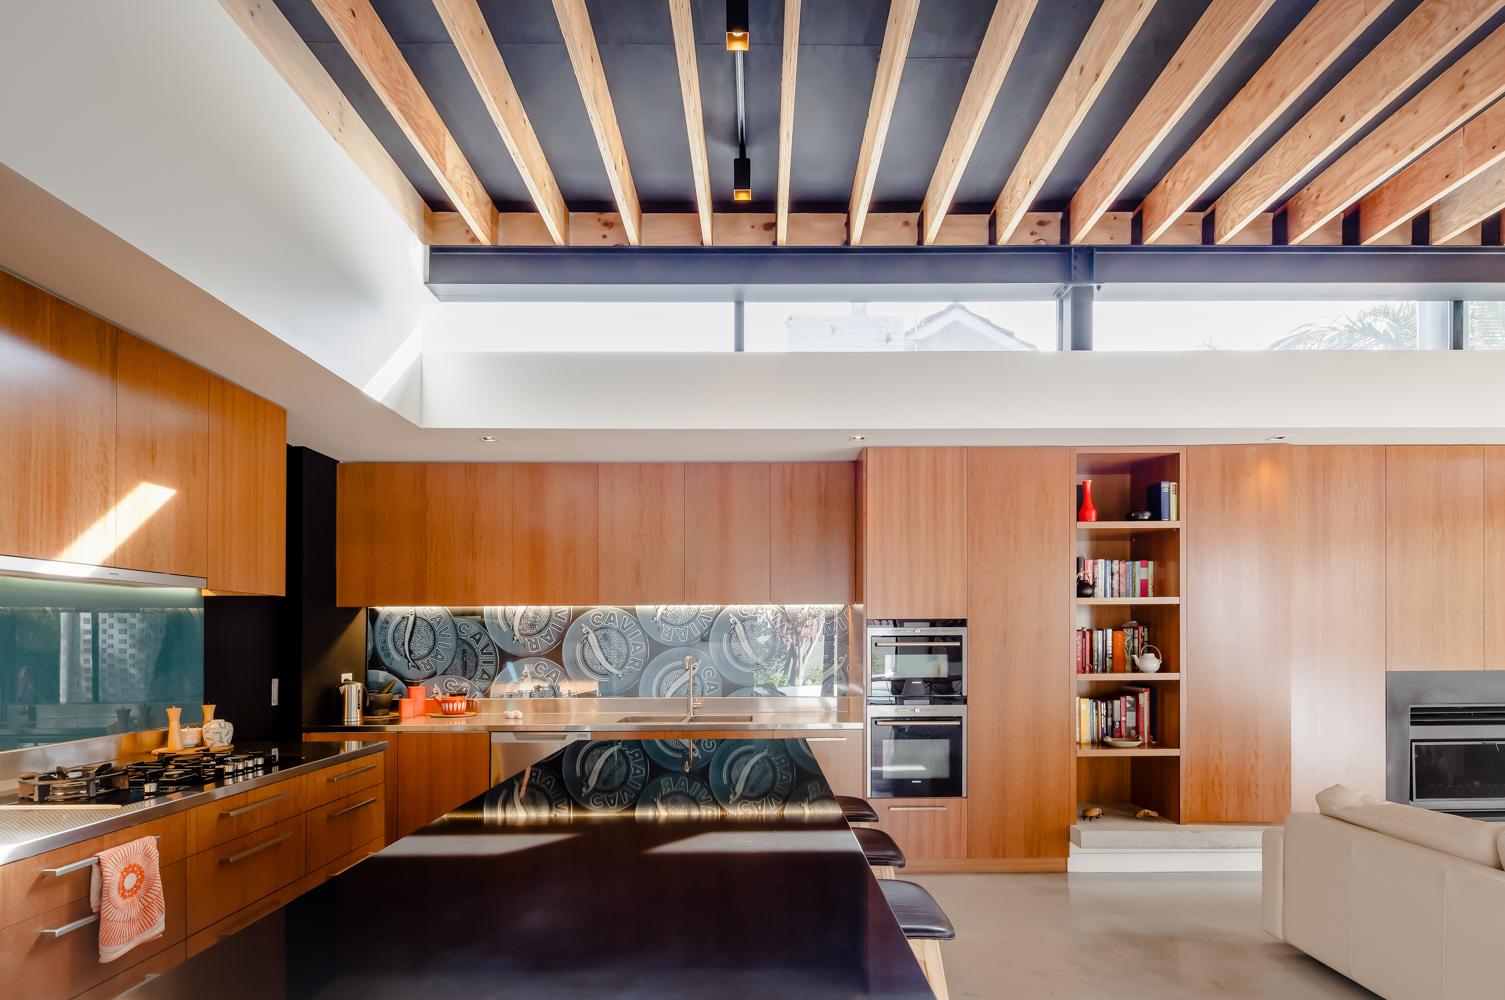 turramurra-house=noxon-giffen-architects-the-design-emotive--7.jpg